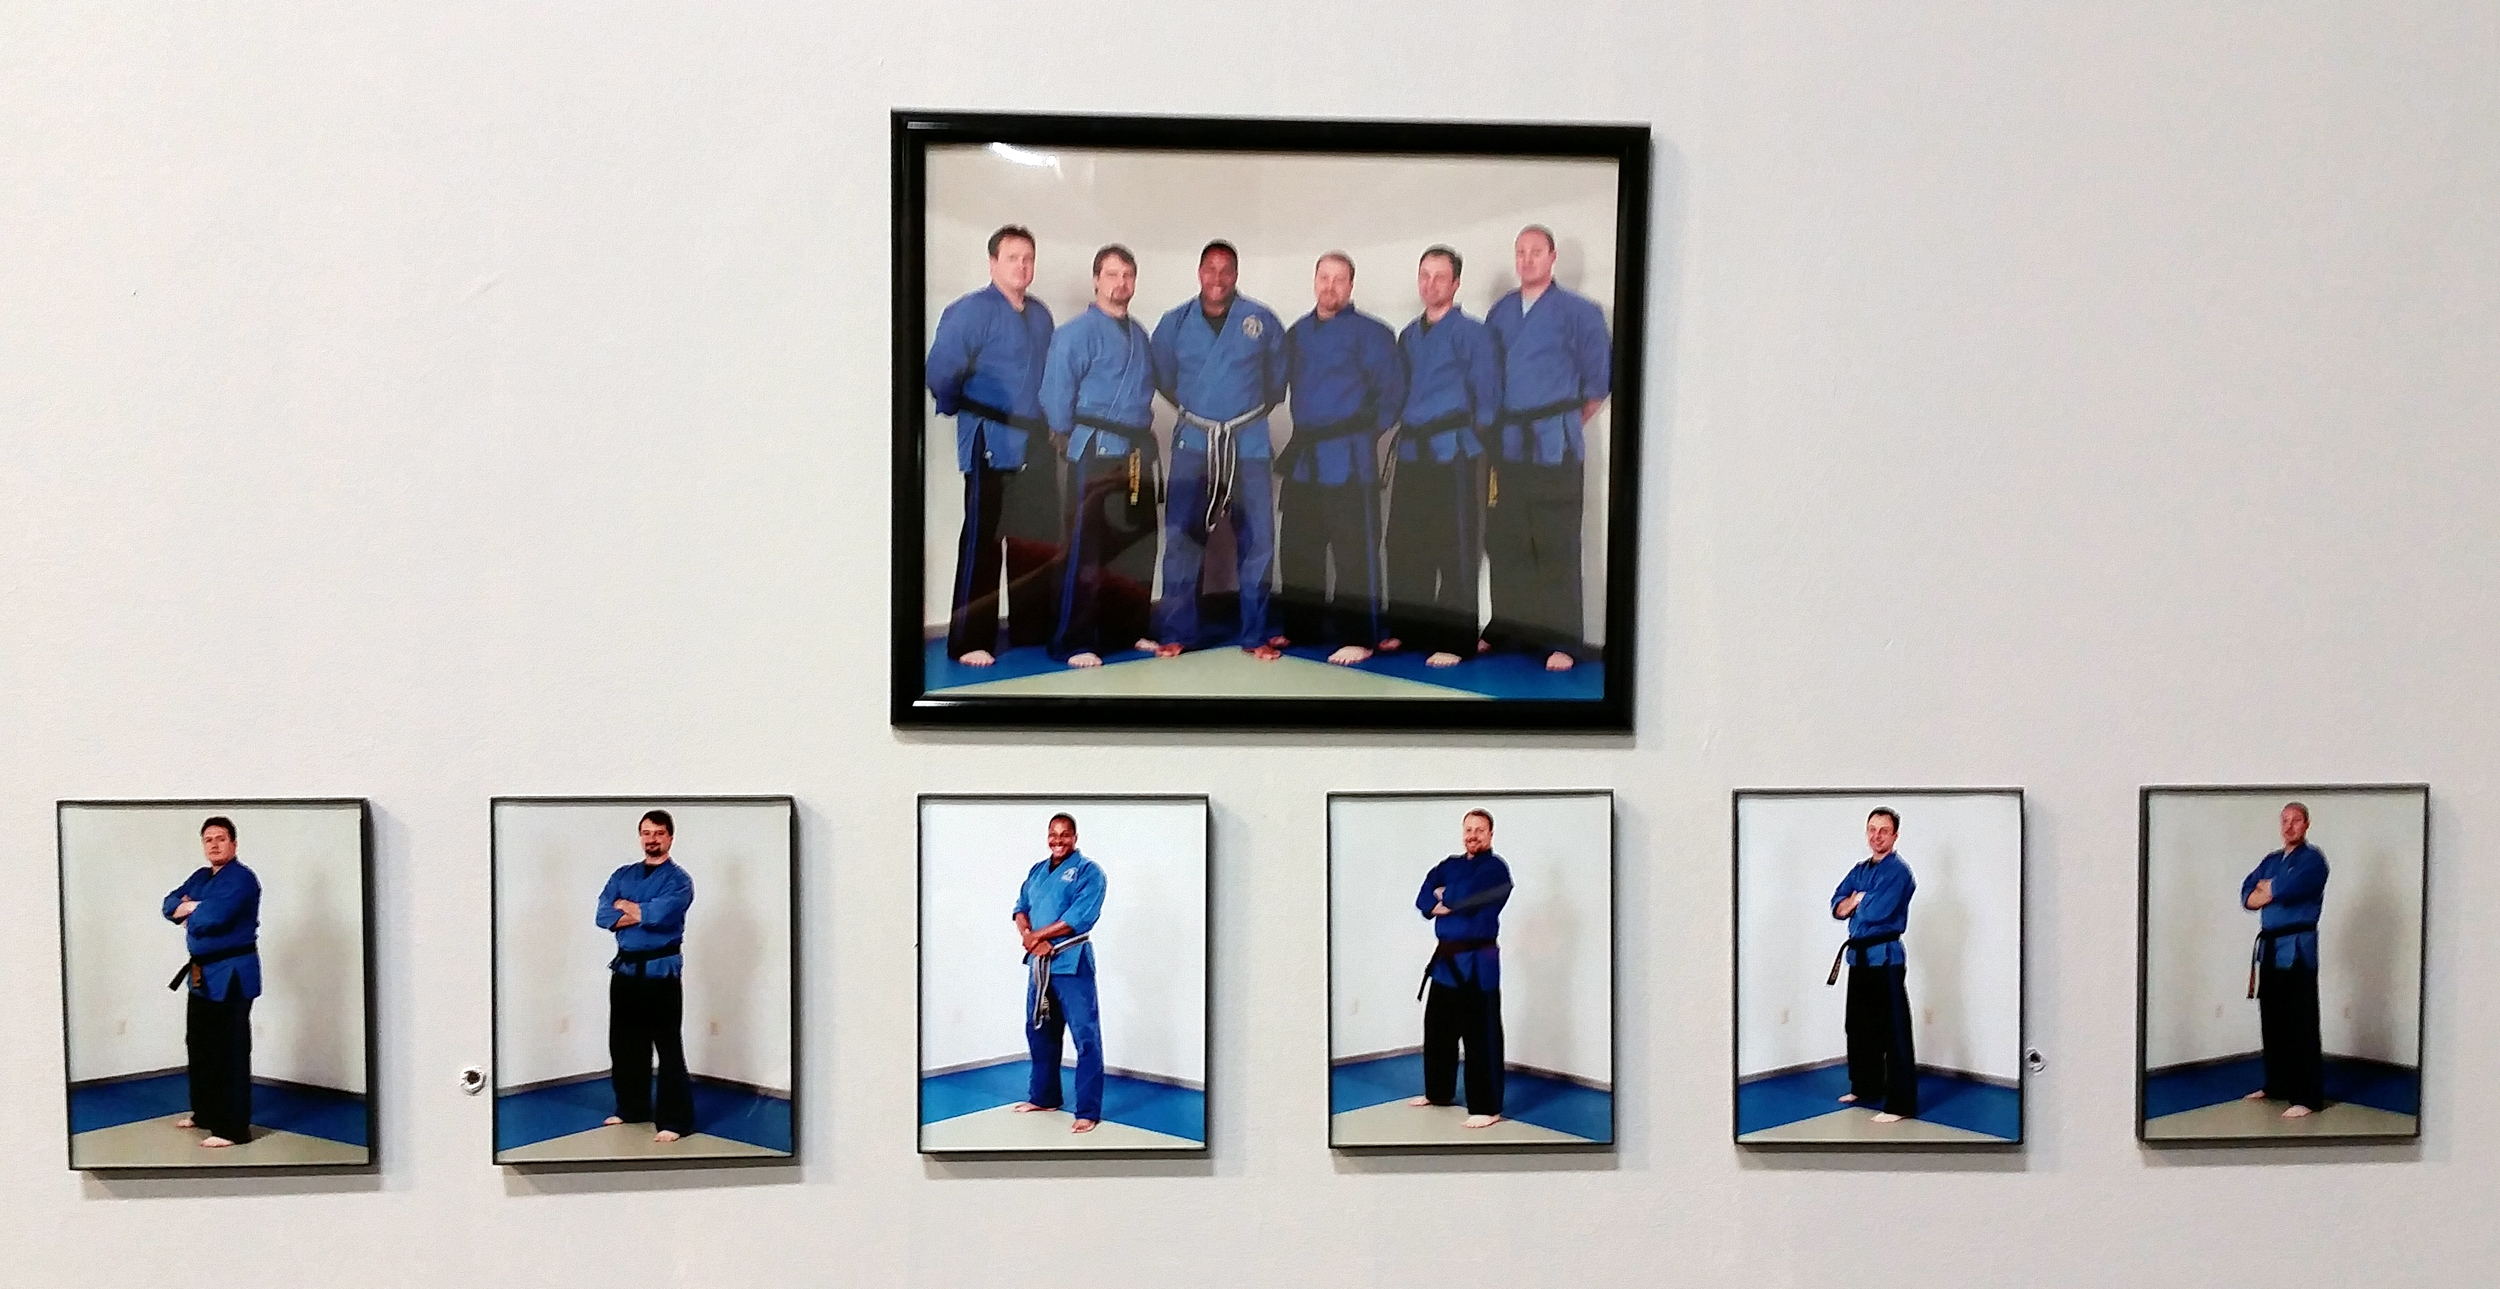 Original Golden Knights Instructors. (Left to Right - Mark Alexander, Scott Baldwin, Marty Weedon, Ryan Zimmerman, Brian McCoy, Scott Alexander